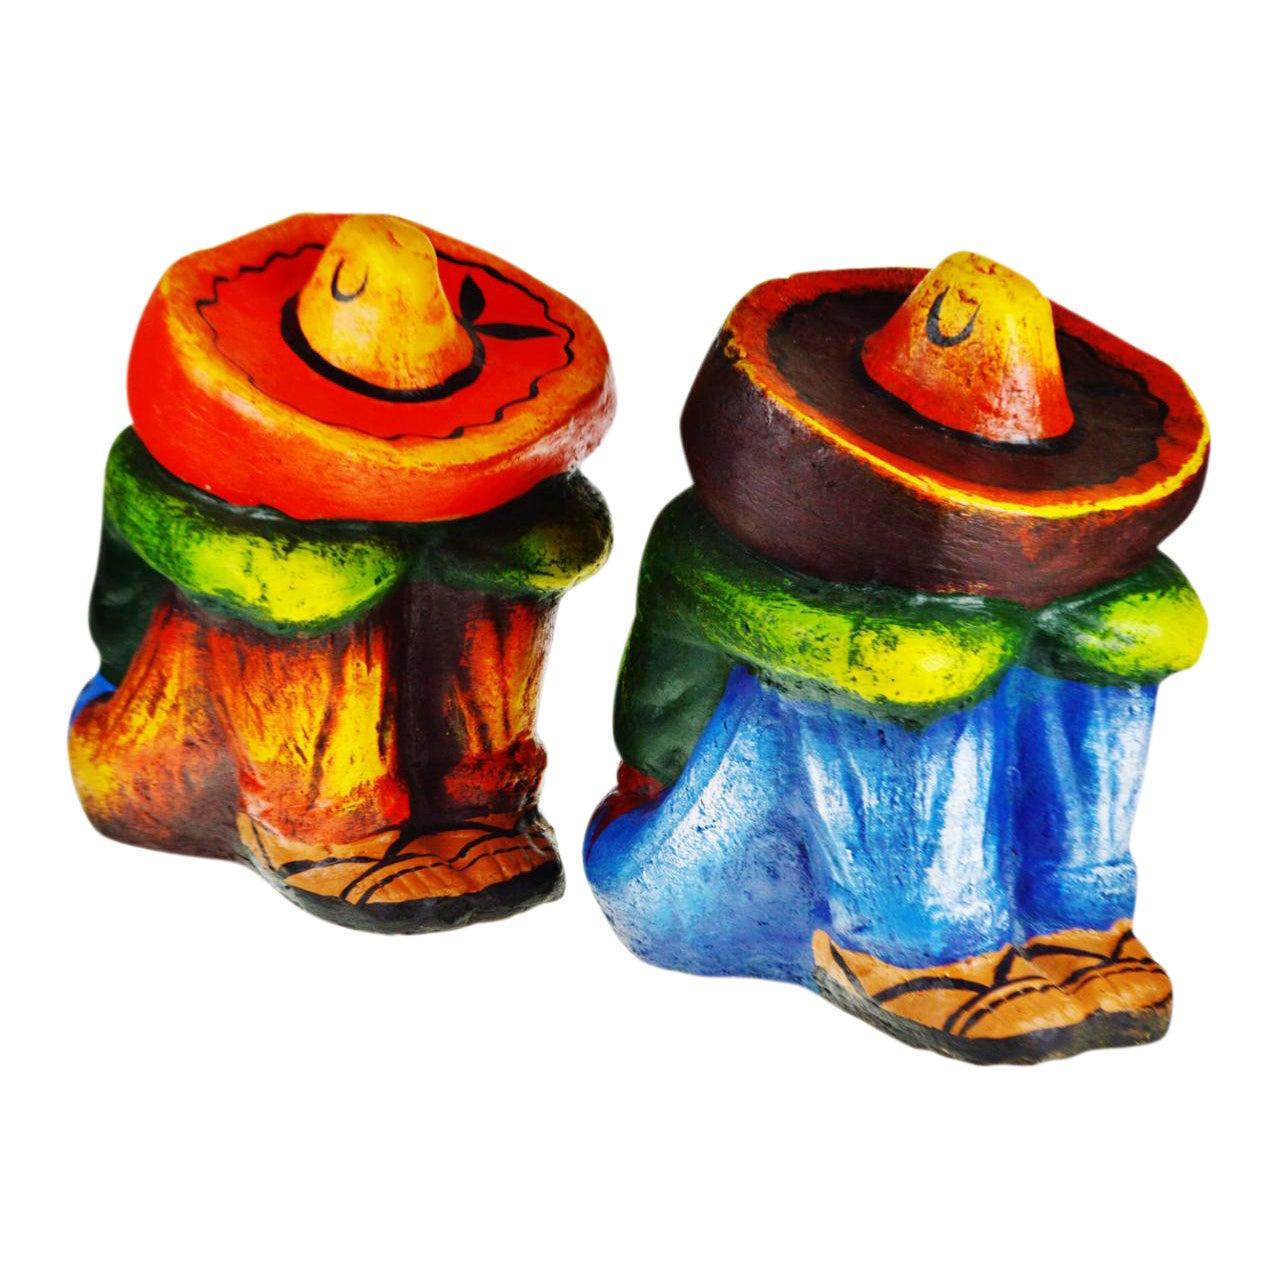 Vintage Ceramic Sleeping Mexican Garden Statues A Pair